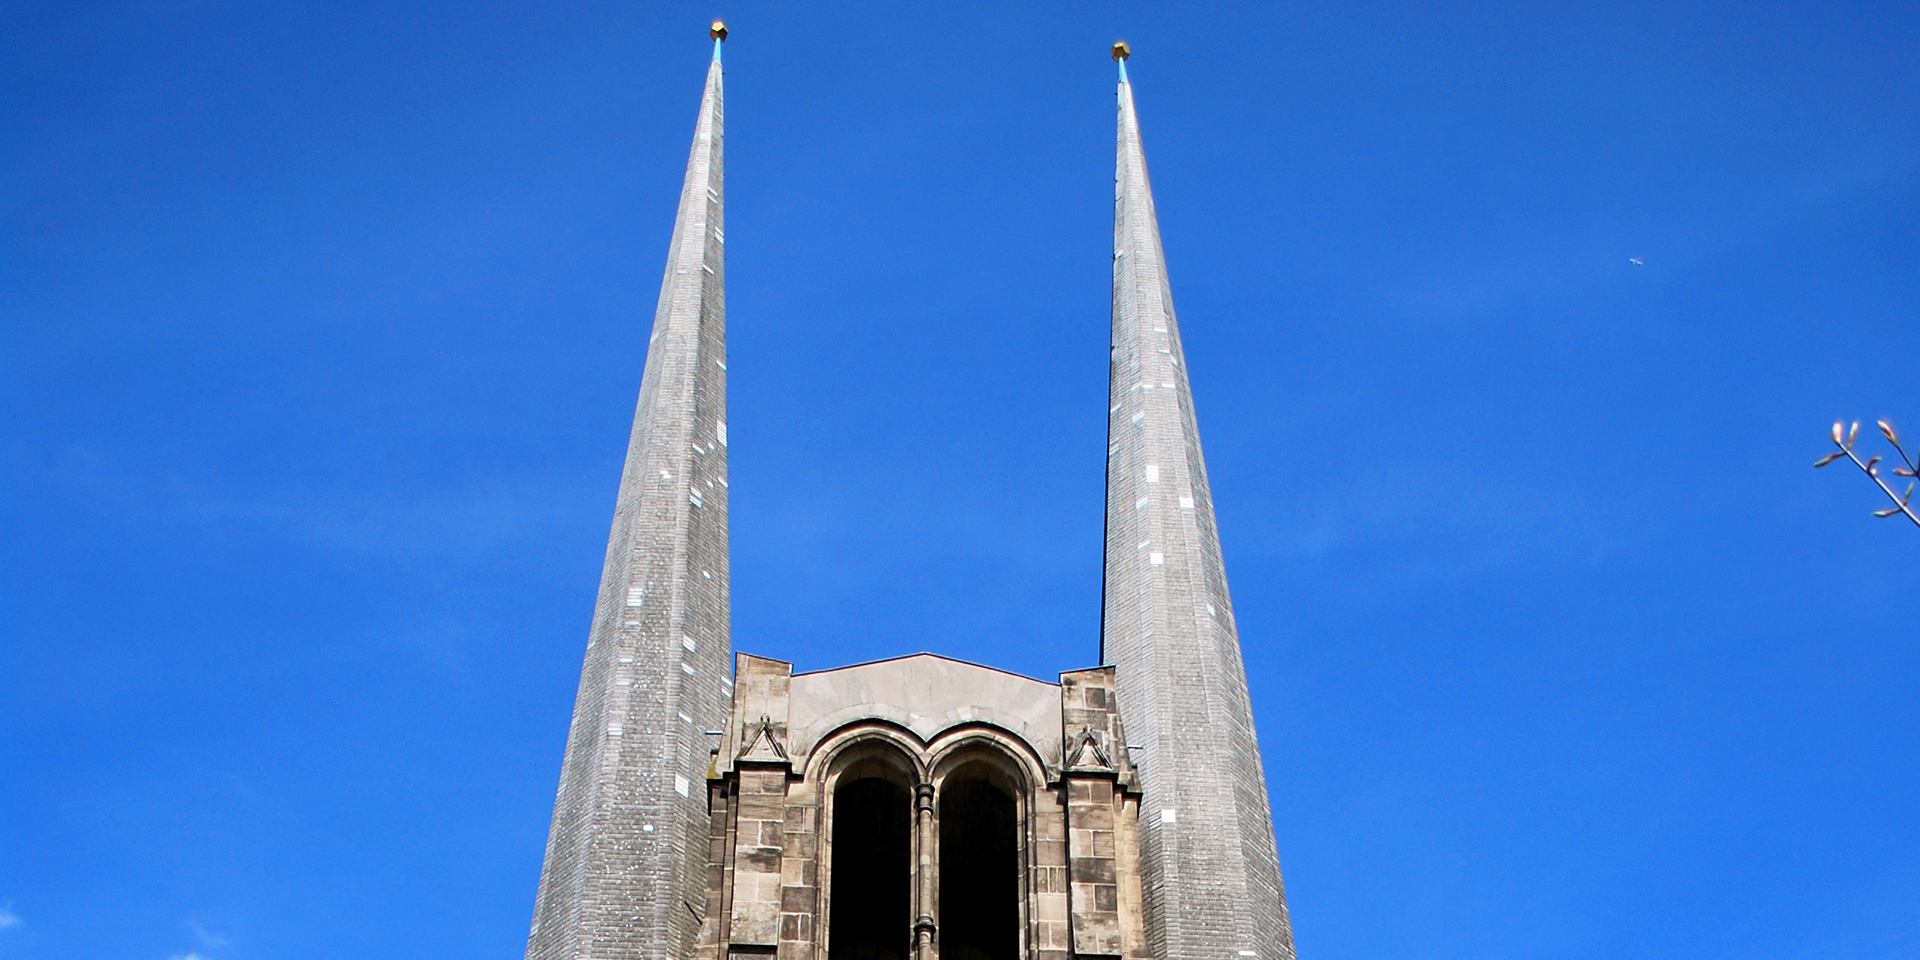 KiBa-Kirche des Monats Mai 2021 in Würzburg